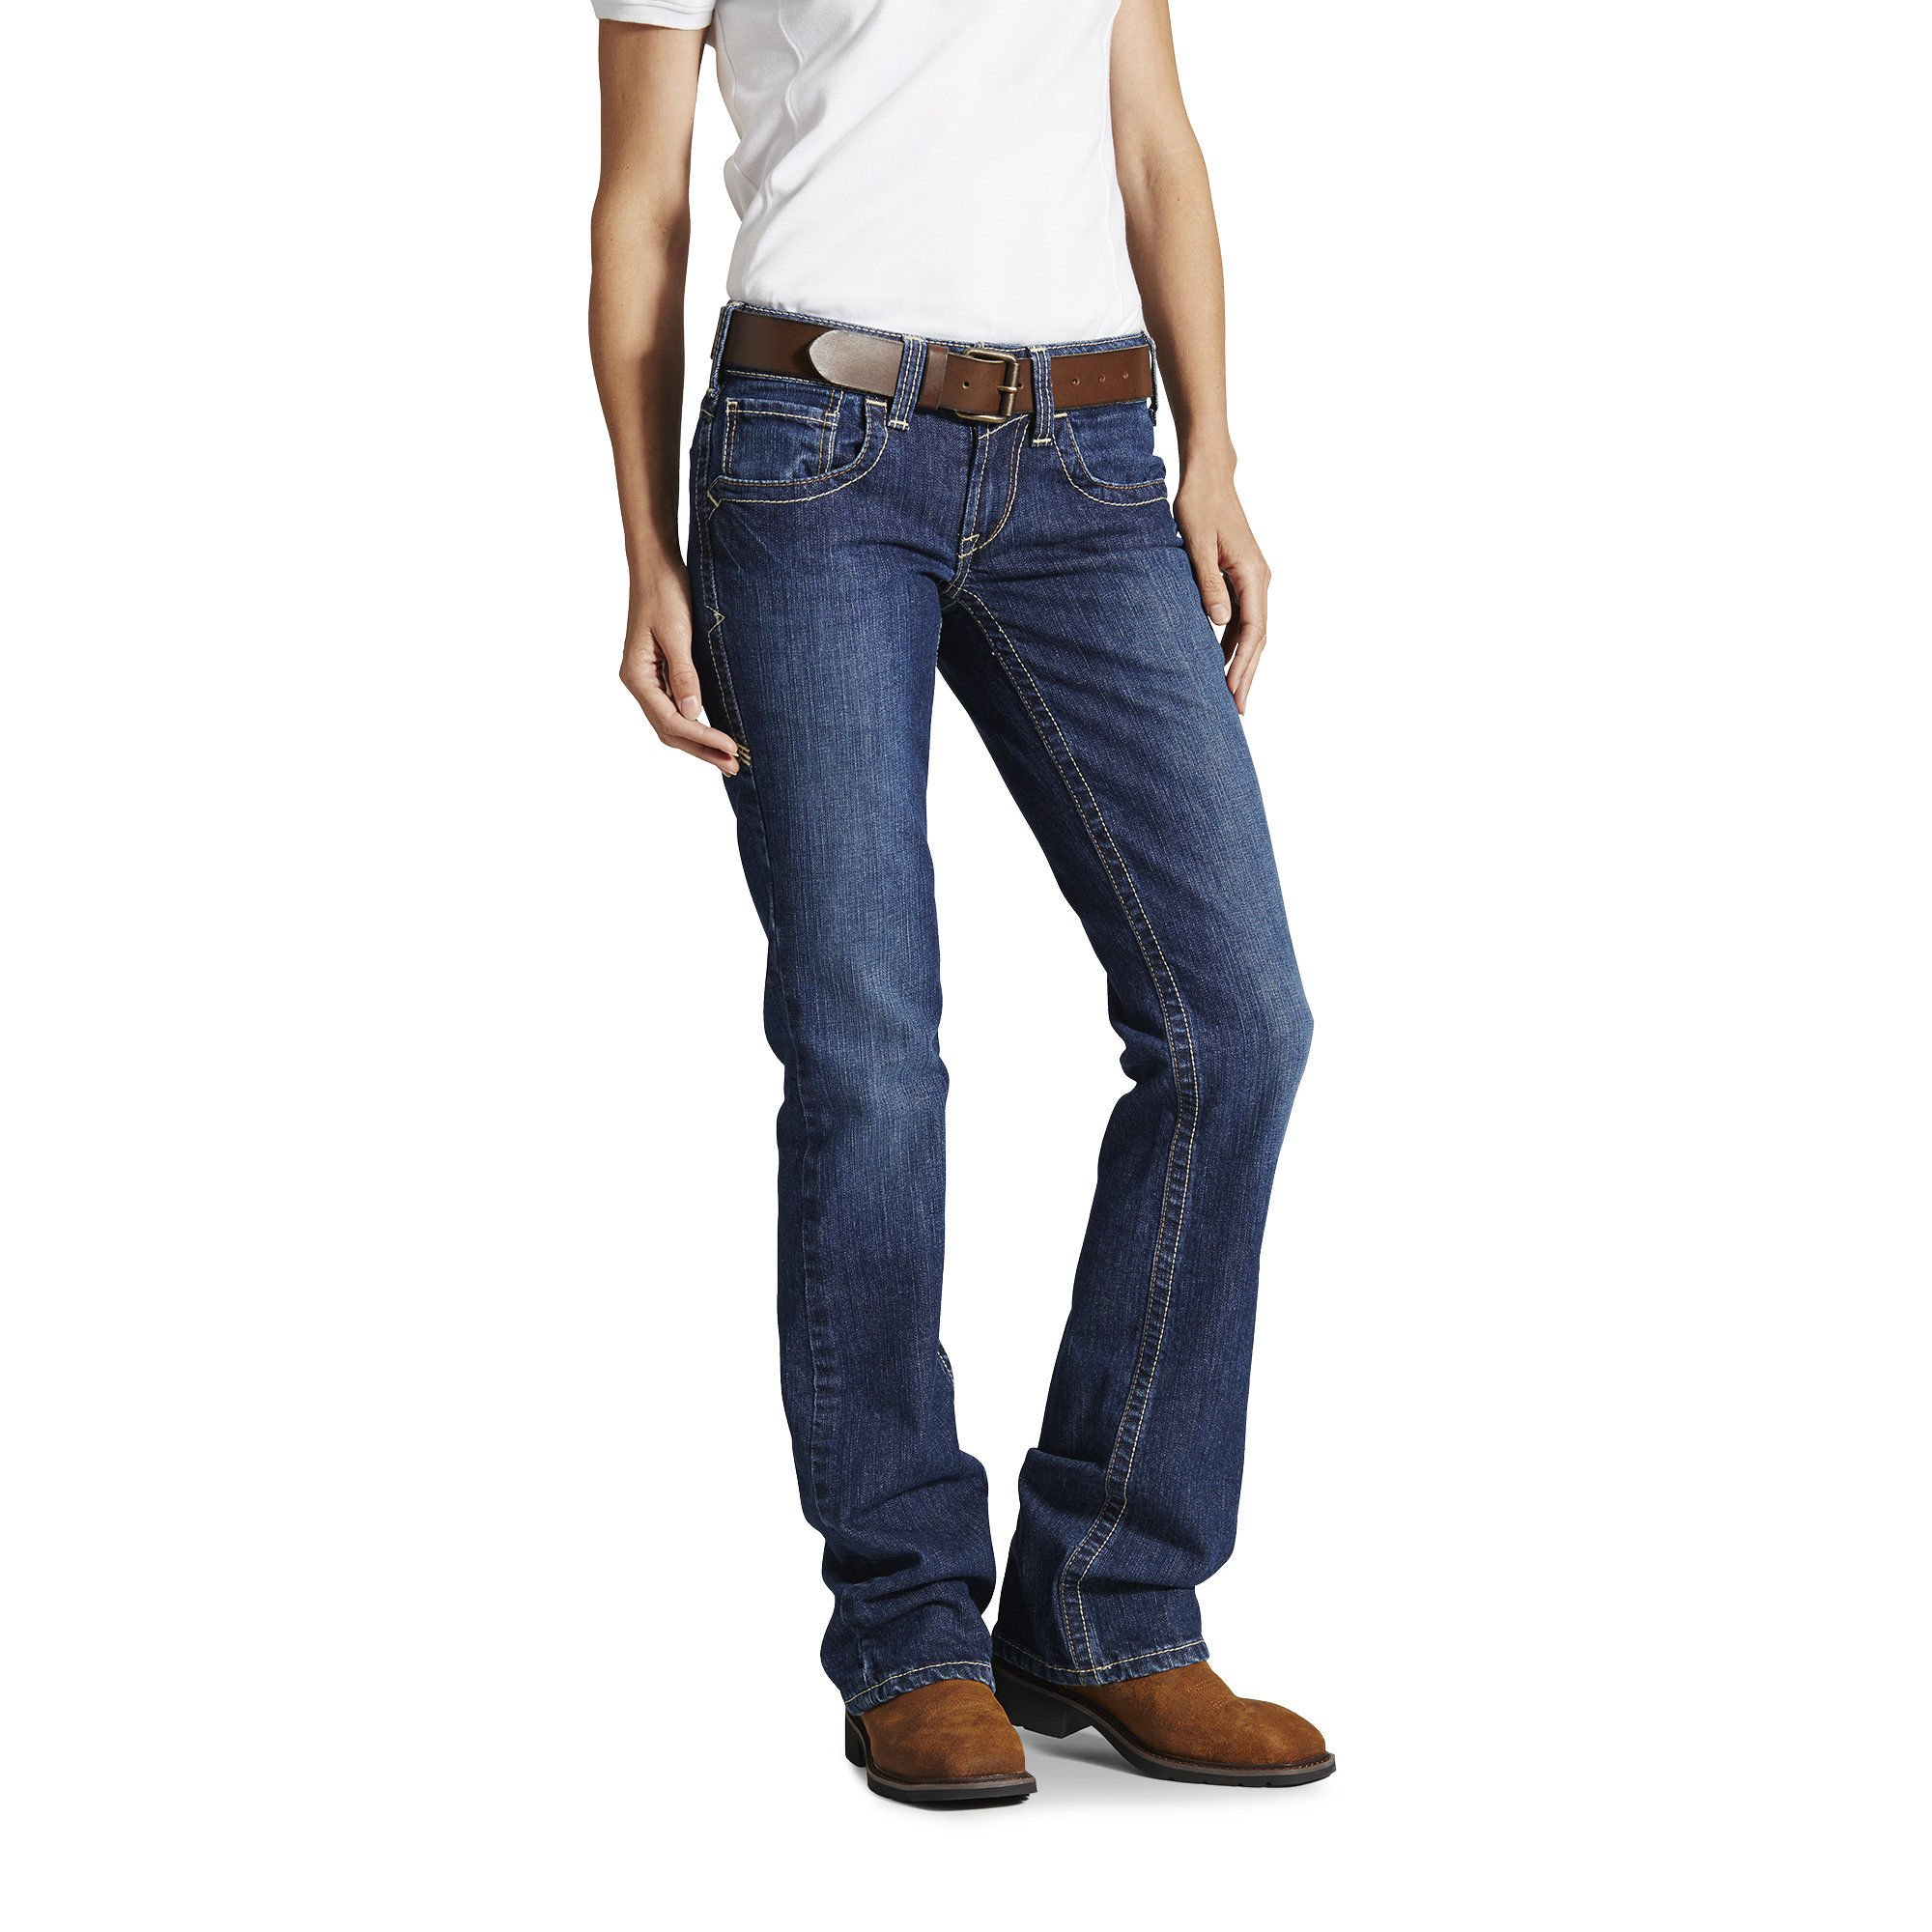 Ariat Women's Flame Resistant Mid Rise Boot Cut Jean, Blue Quartz, 31 Regular